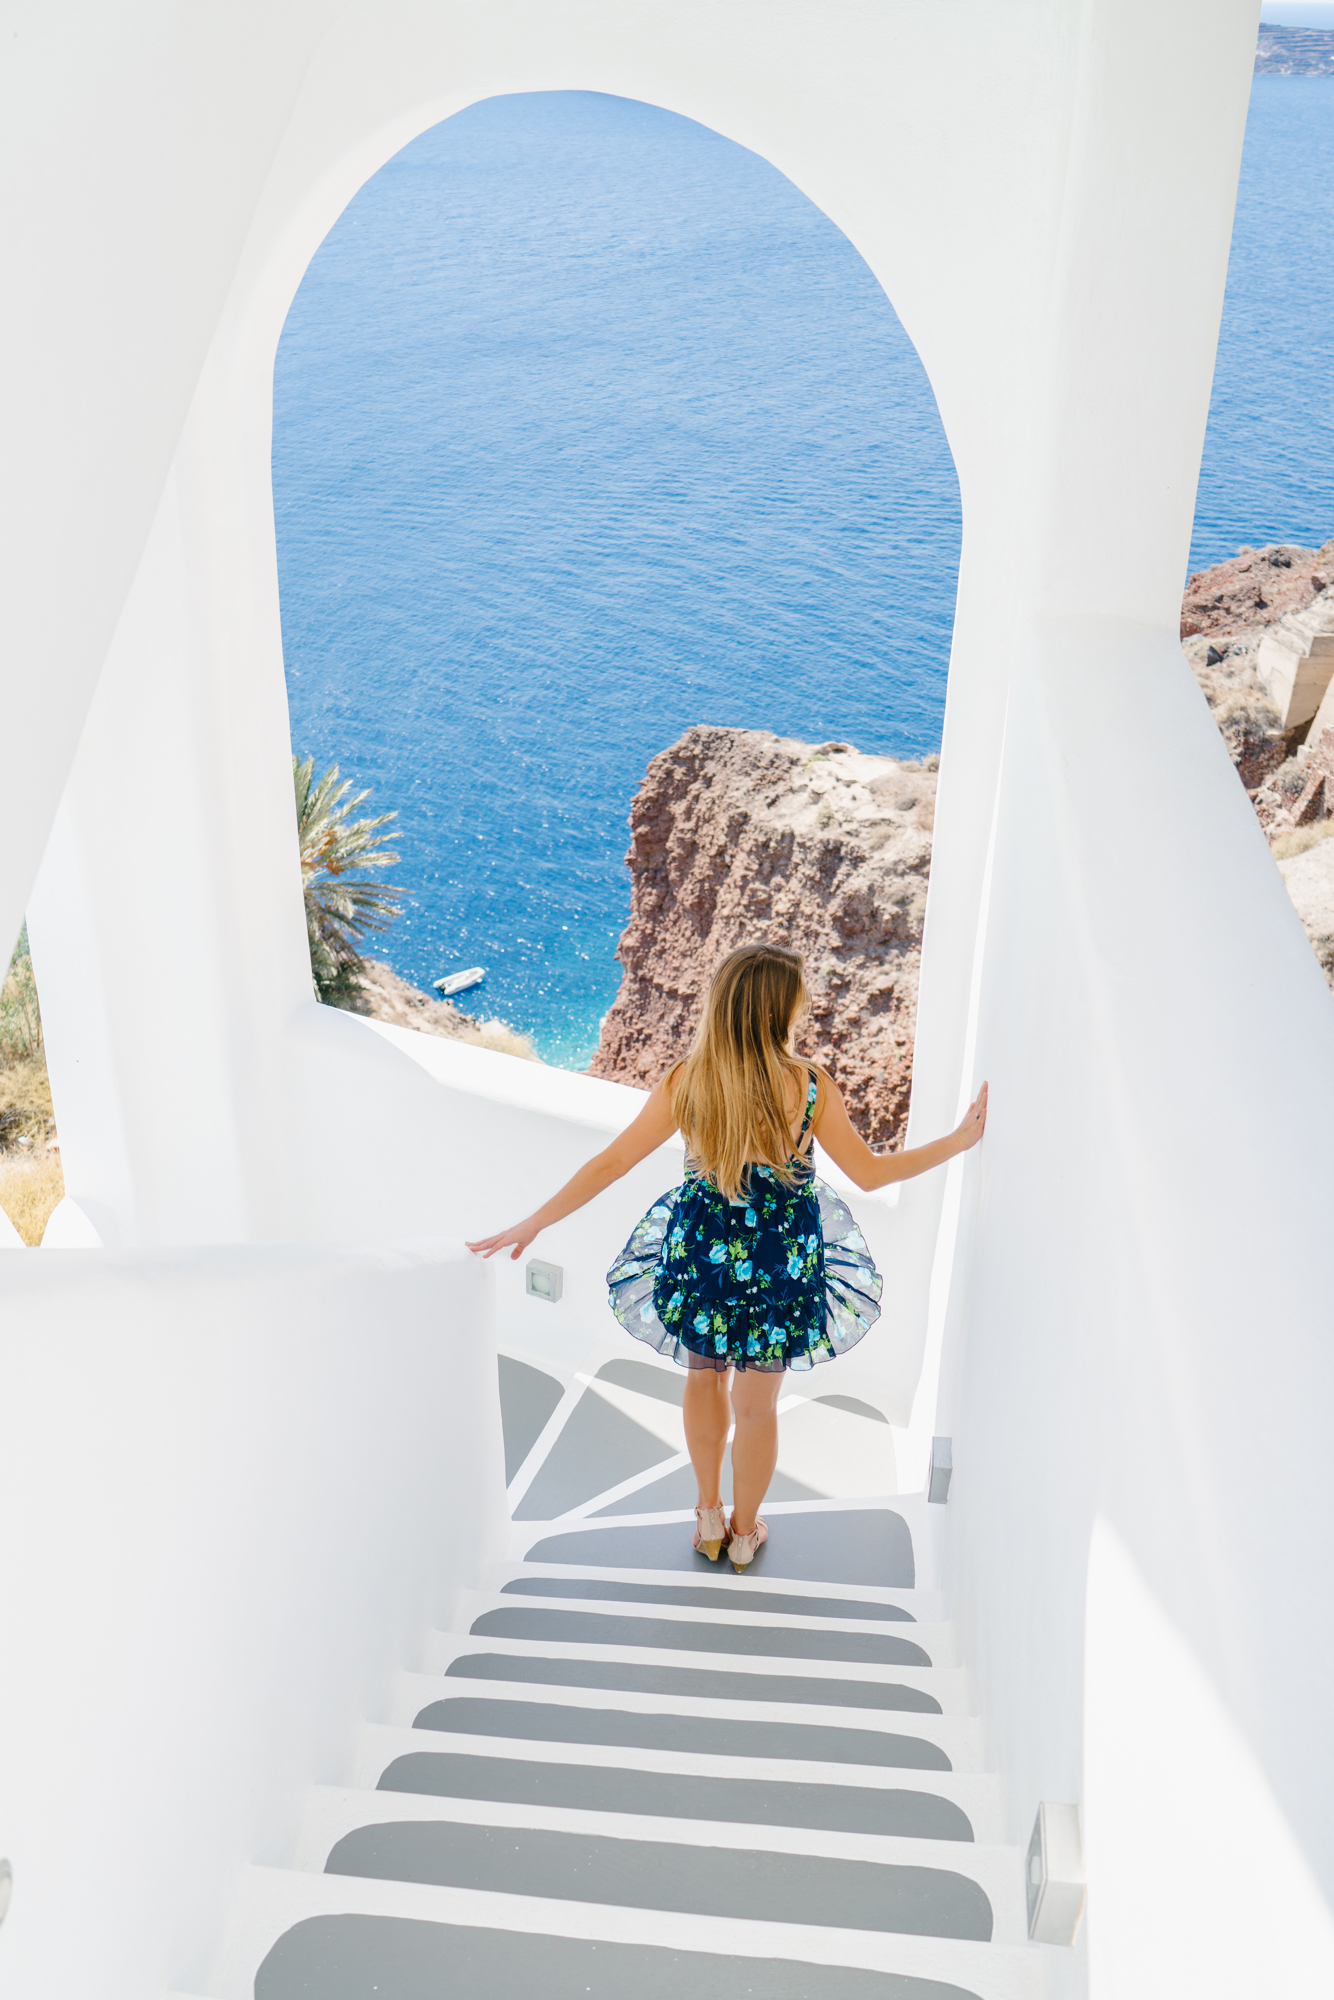 Blue floral dress in Santorini